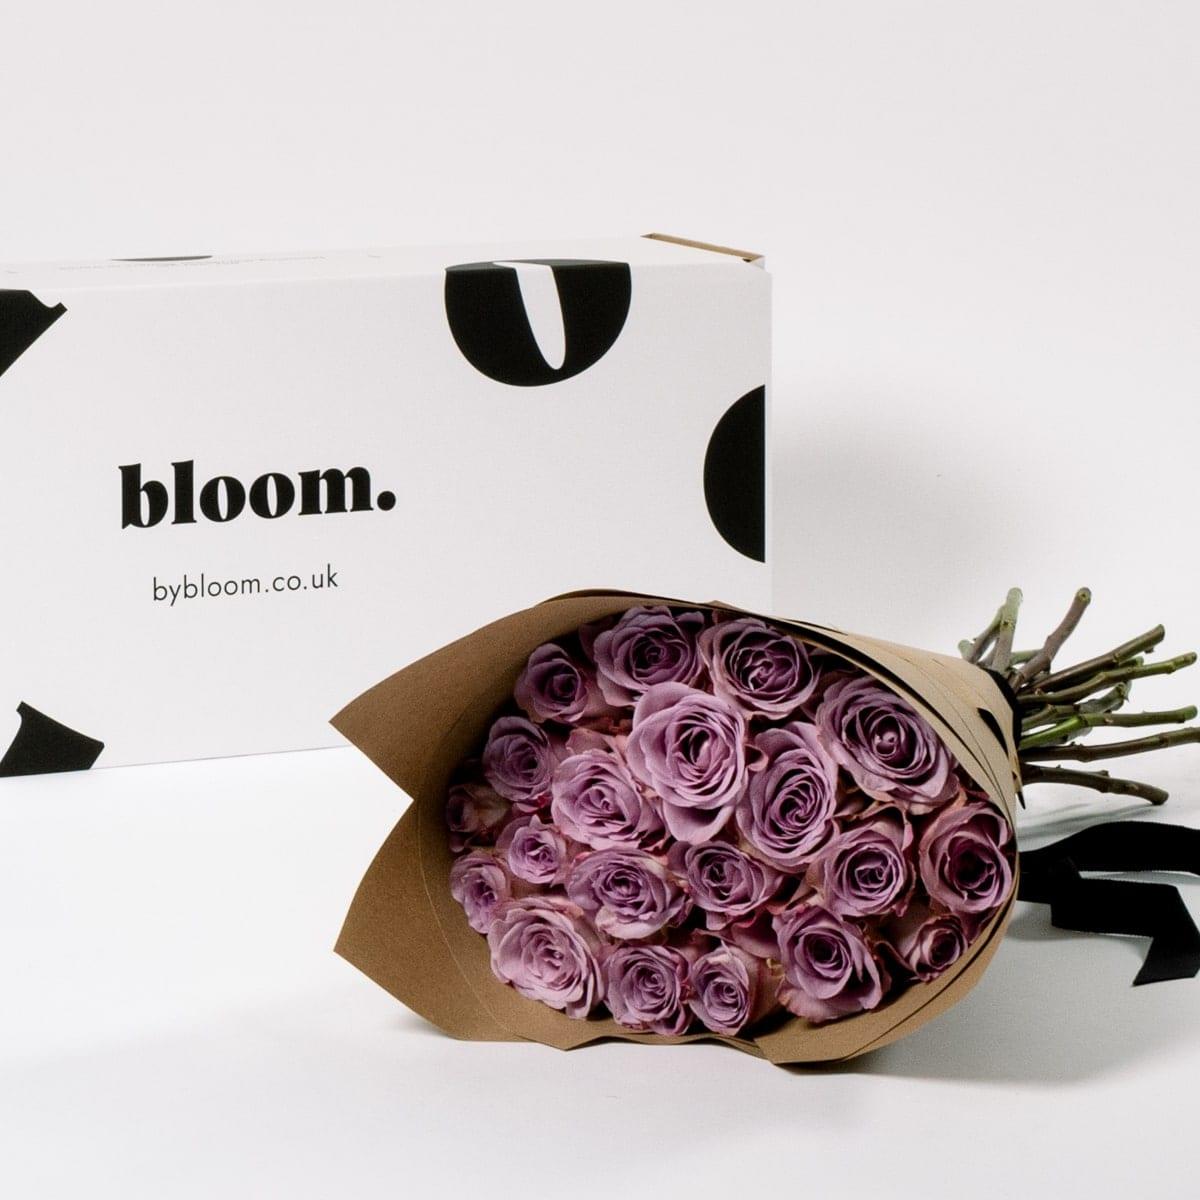 Bloom Flower Delivery | Memory Lane Roses